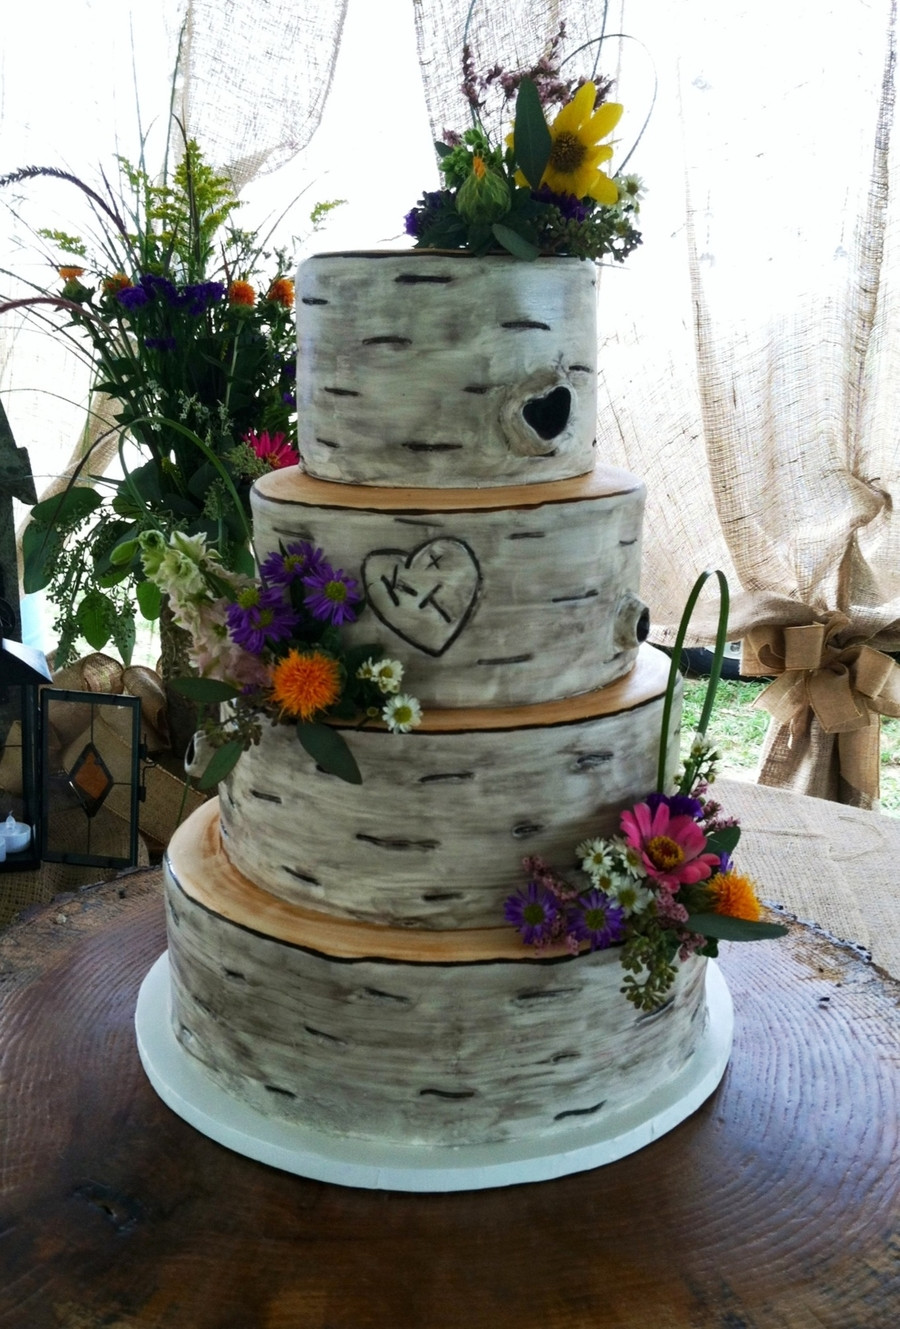 Aspen Tree Wedding Cakes  Birch Tree Wedding Cake CakeCentral